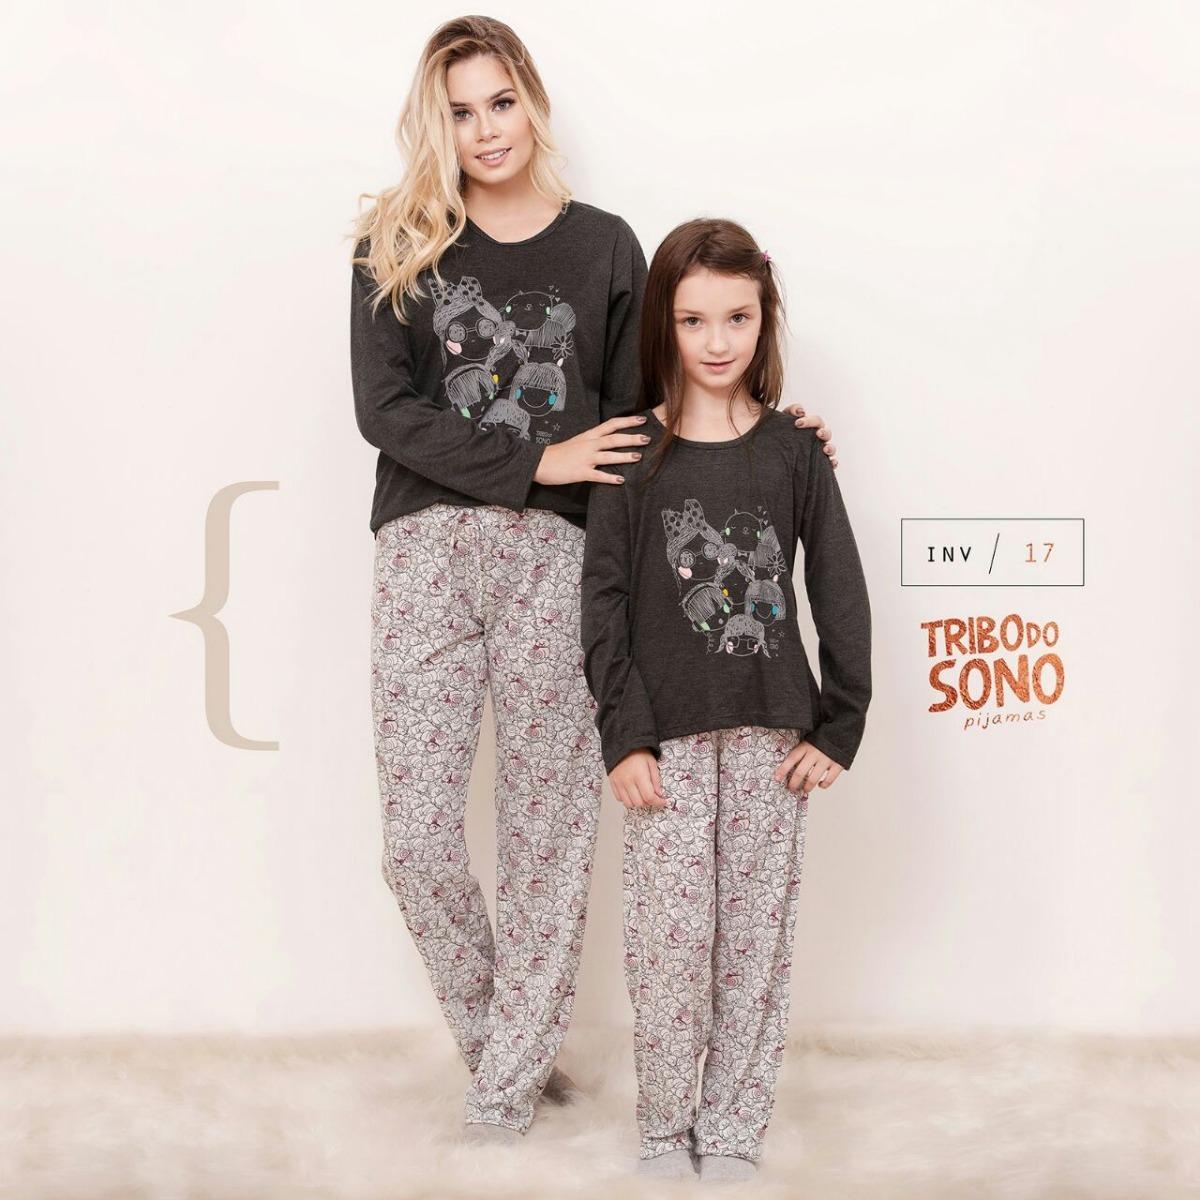 fcc919b00fff85 Kit 2 Pijamas Mãe Filha Inverno Blusa Estampada Menina